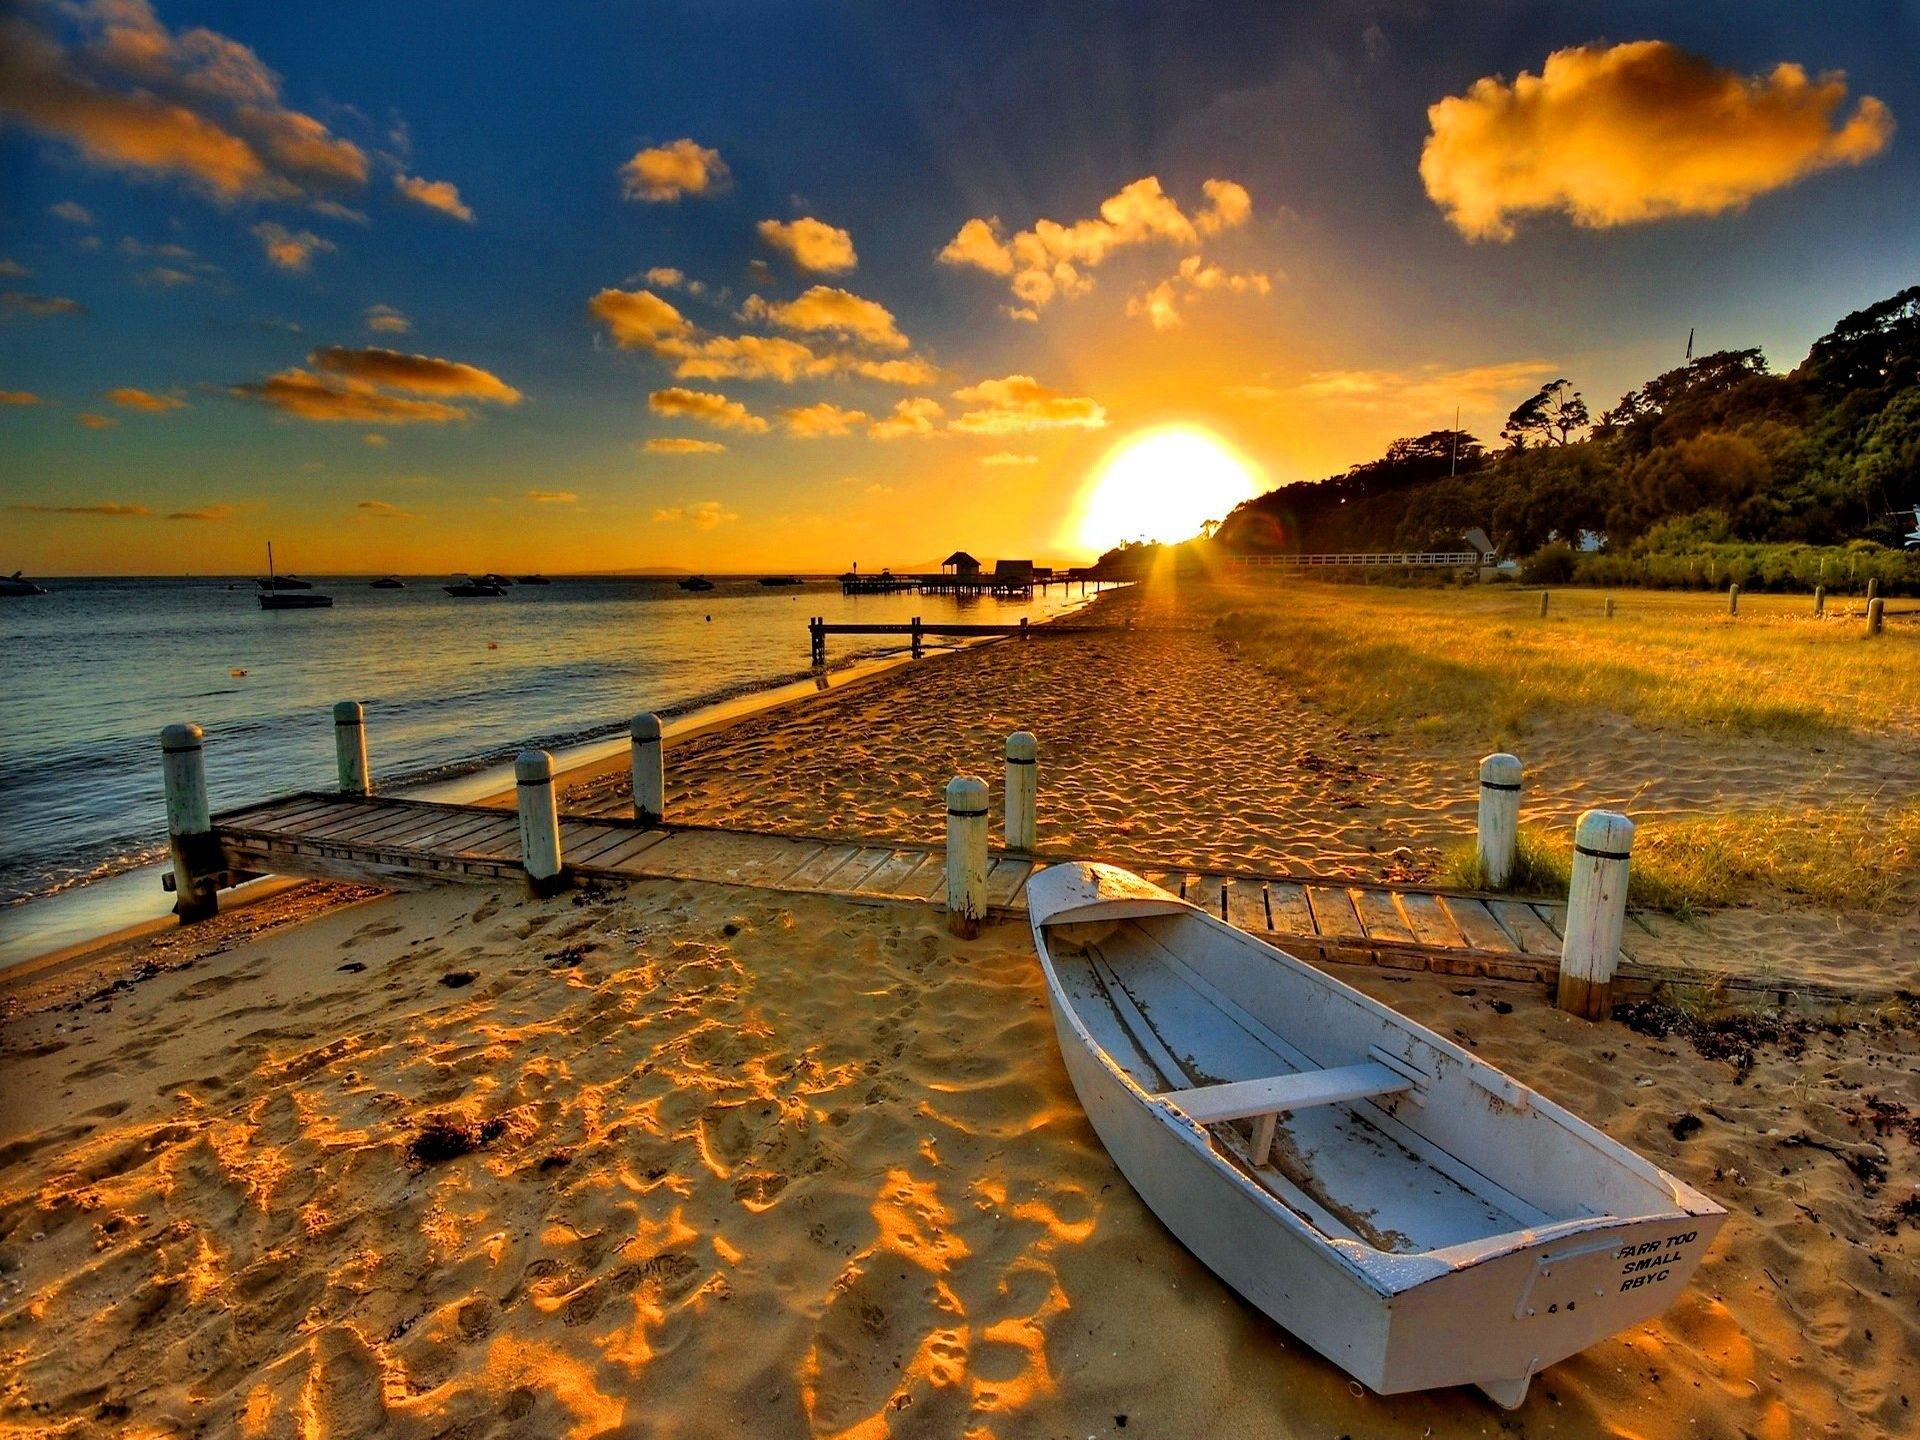 romantic beach sunset wallpaper full hd as wallpaper hd